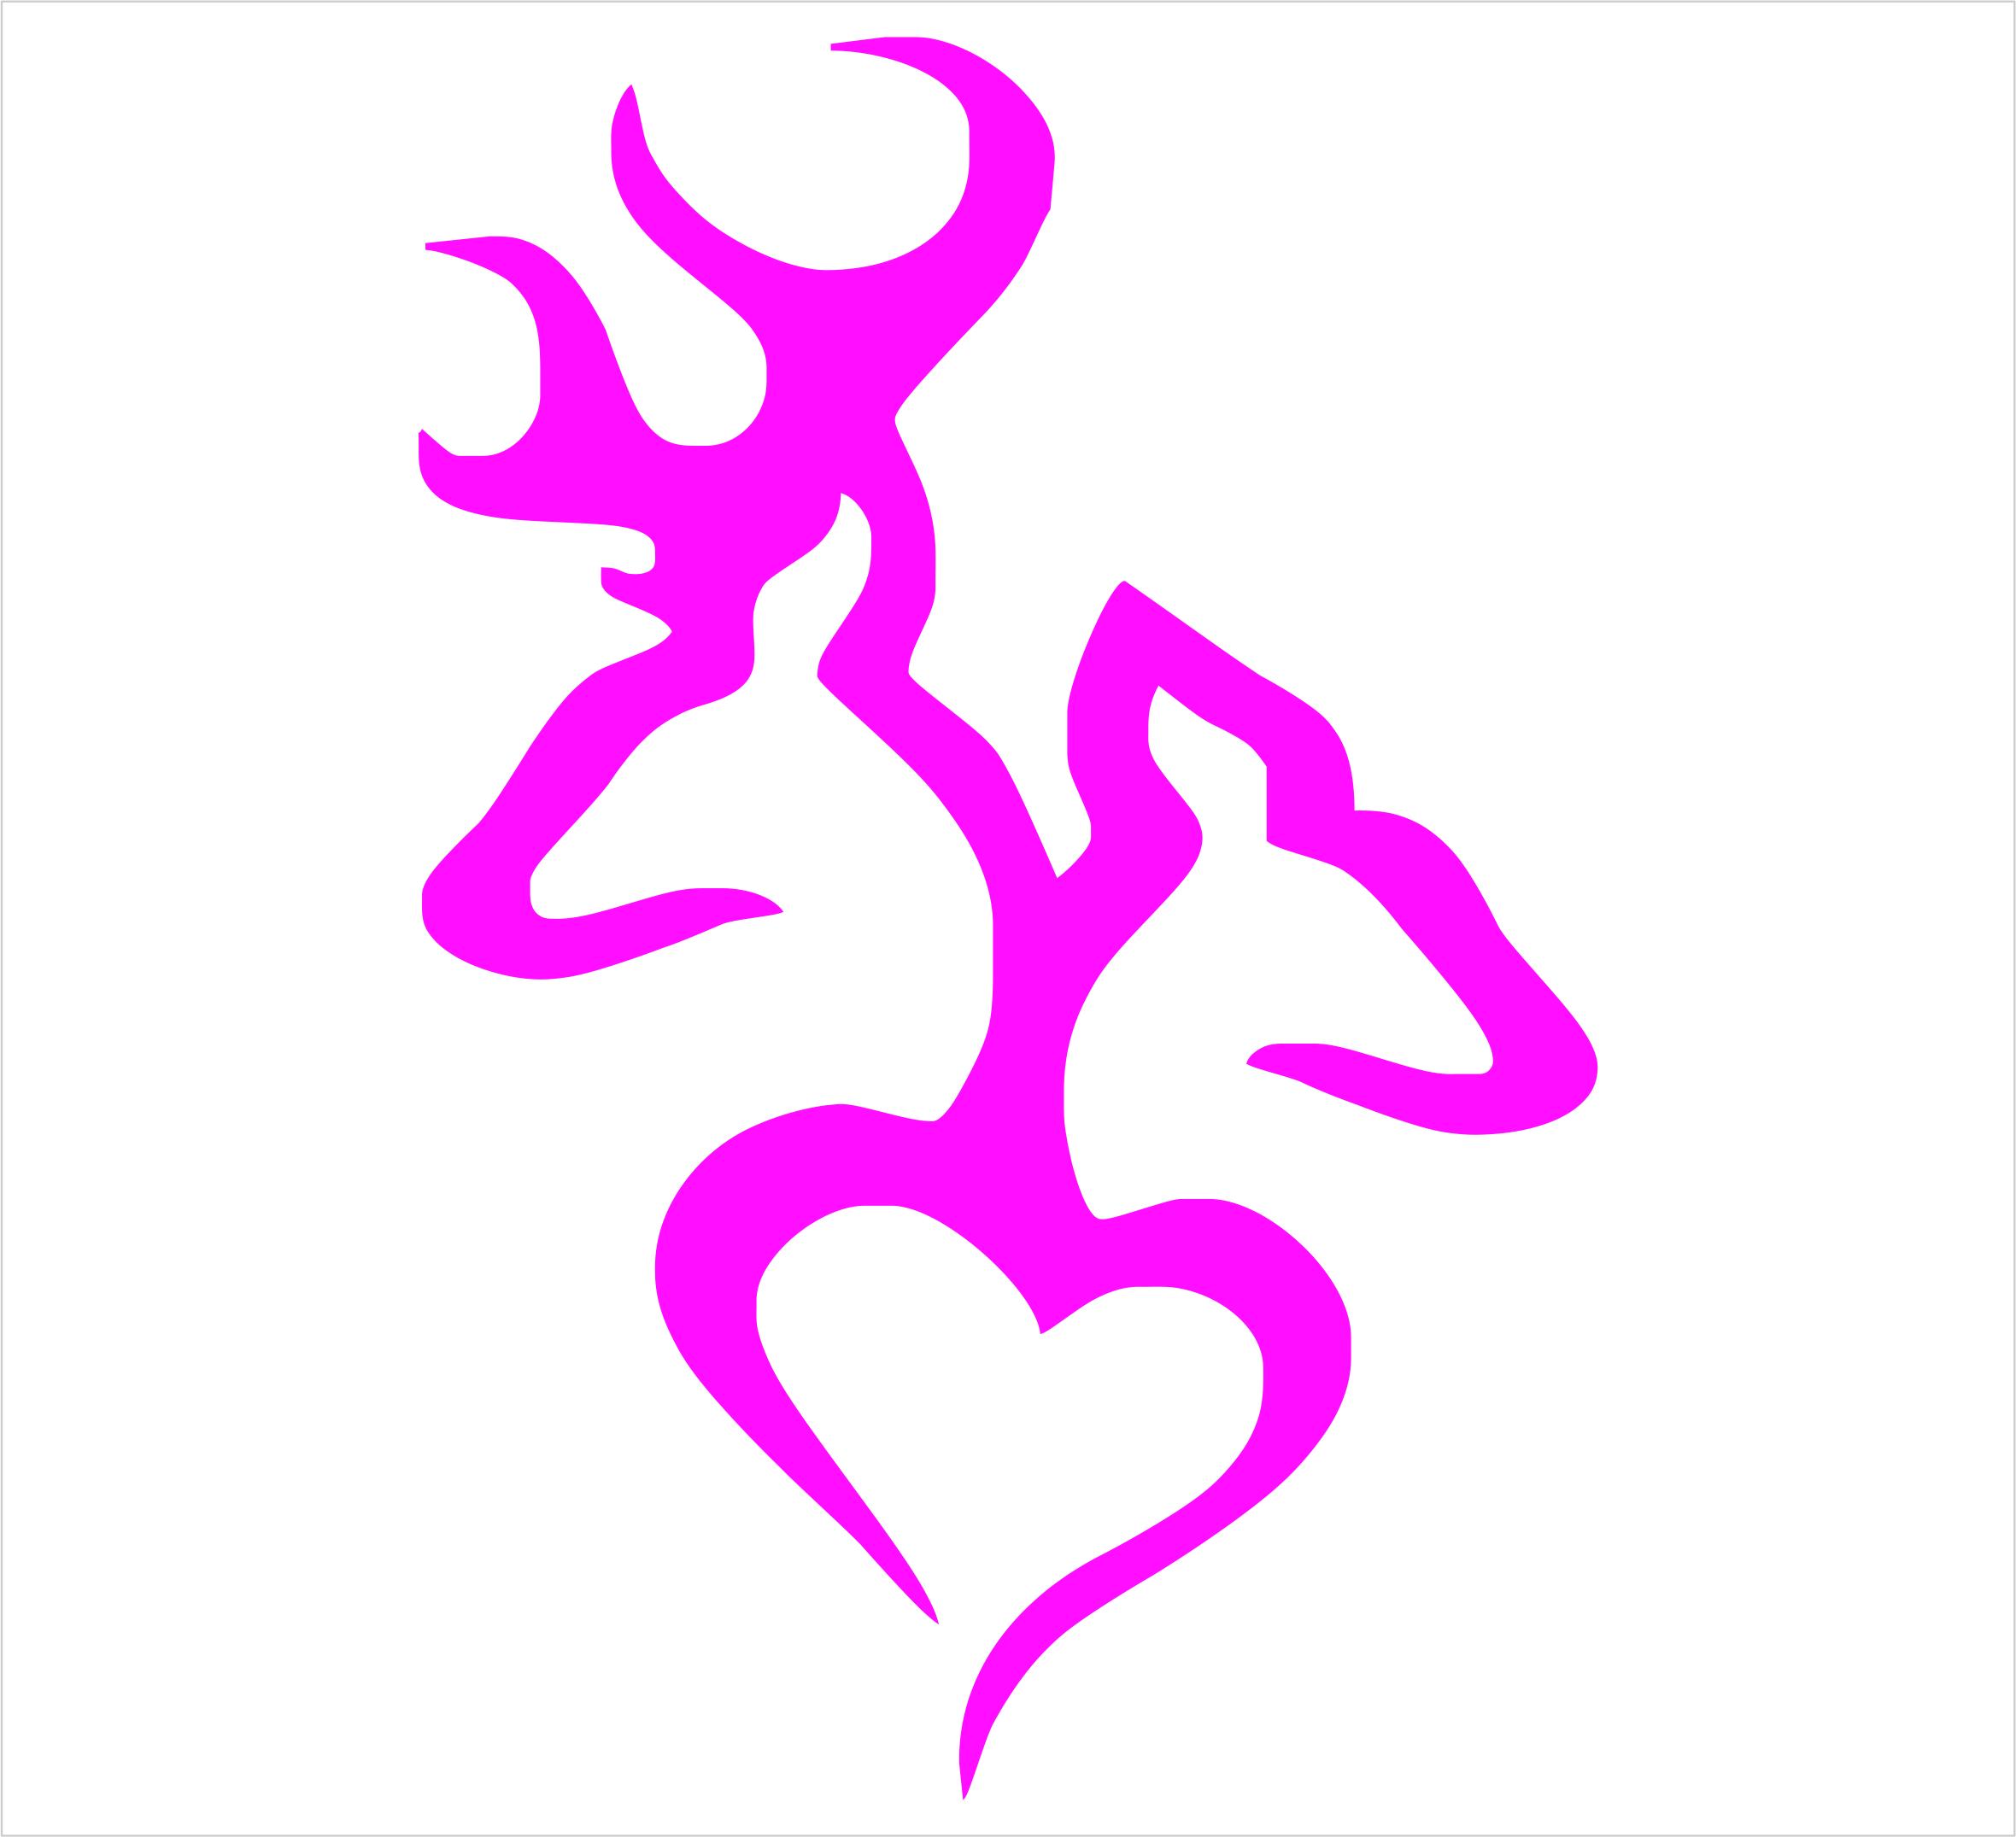 Camo Browning Heart Backgrounds Browning logo heart camo 2360x2151